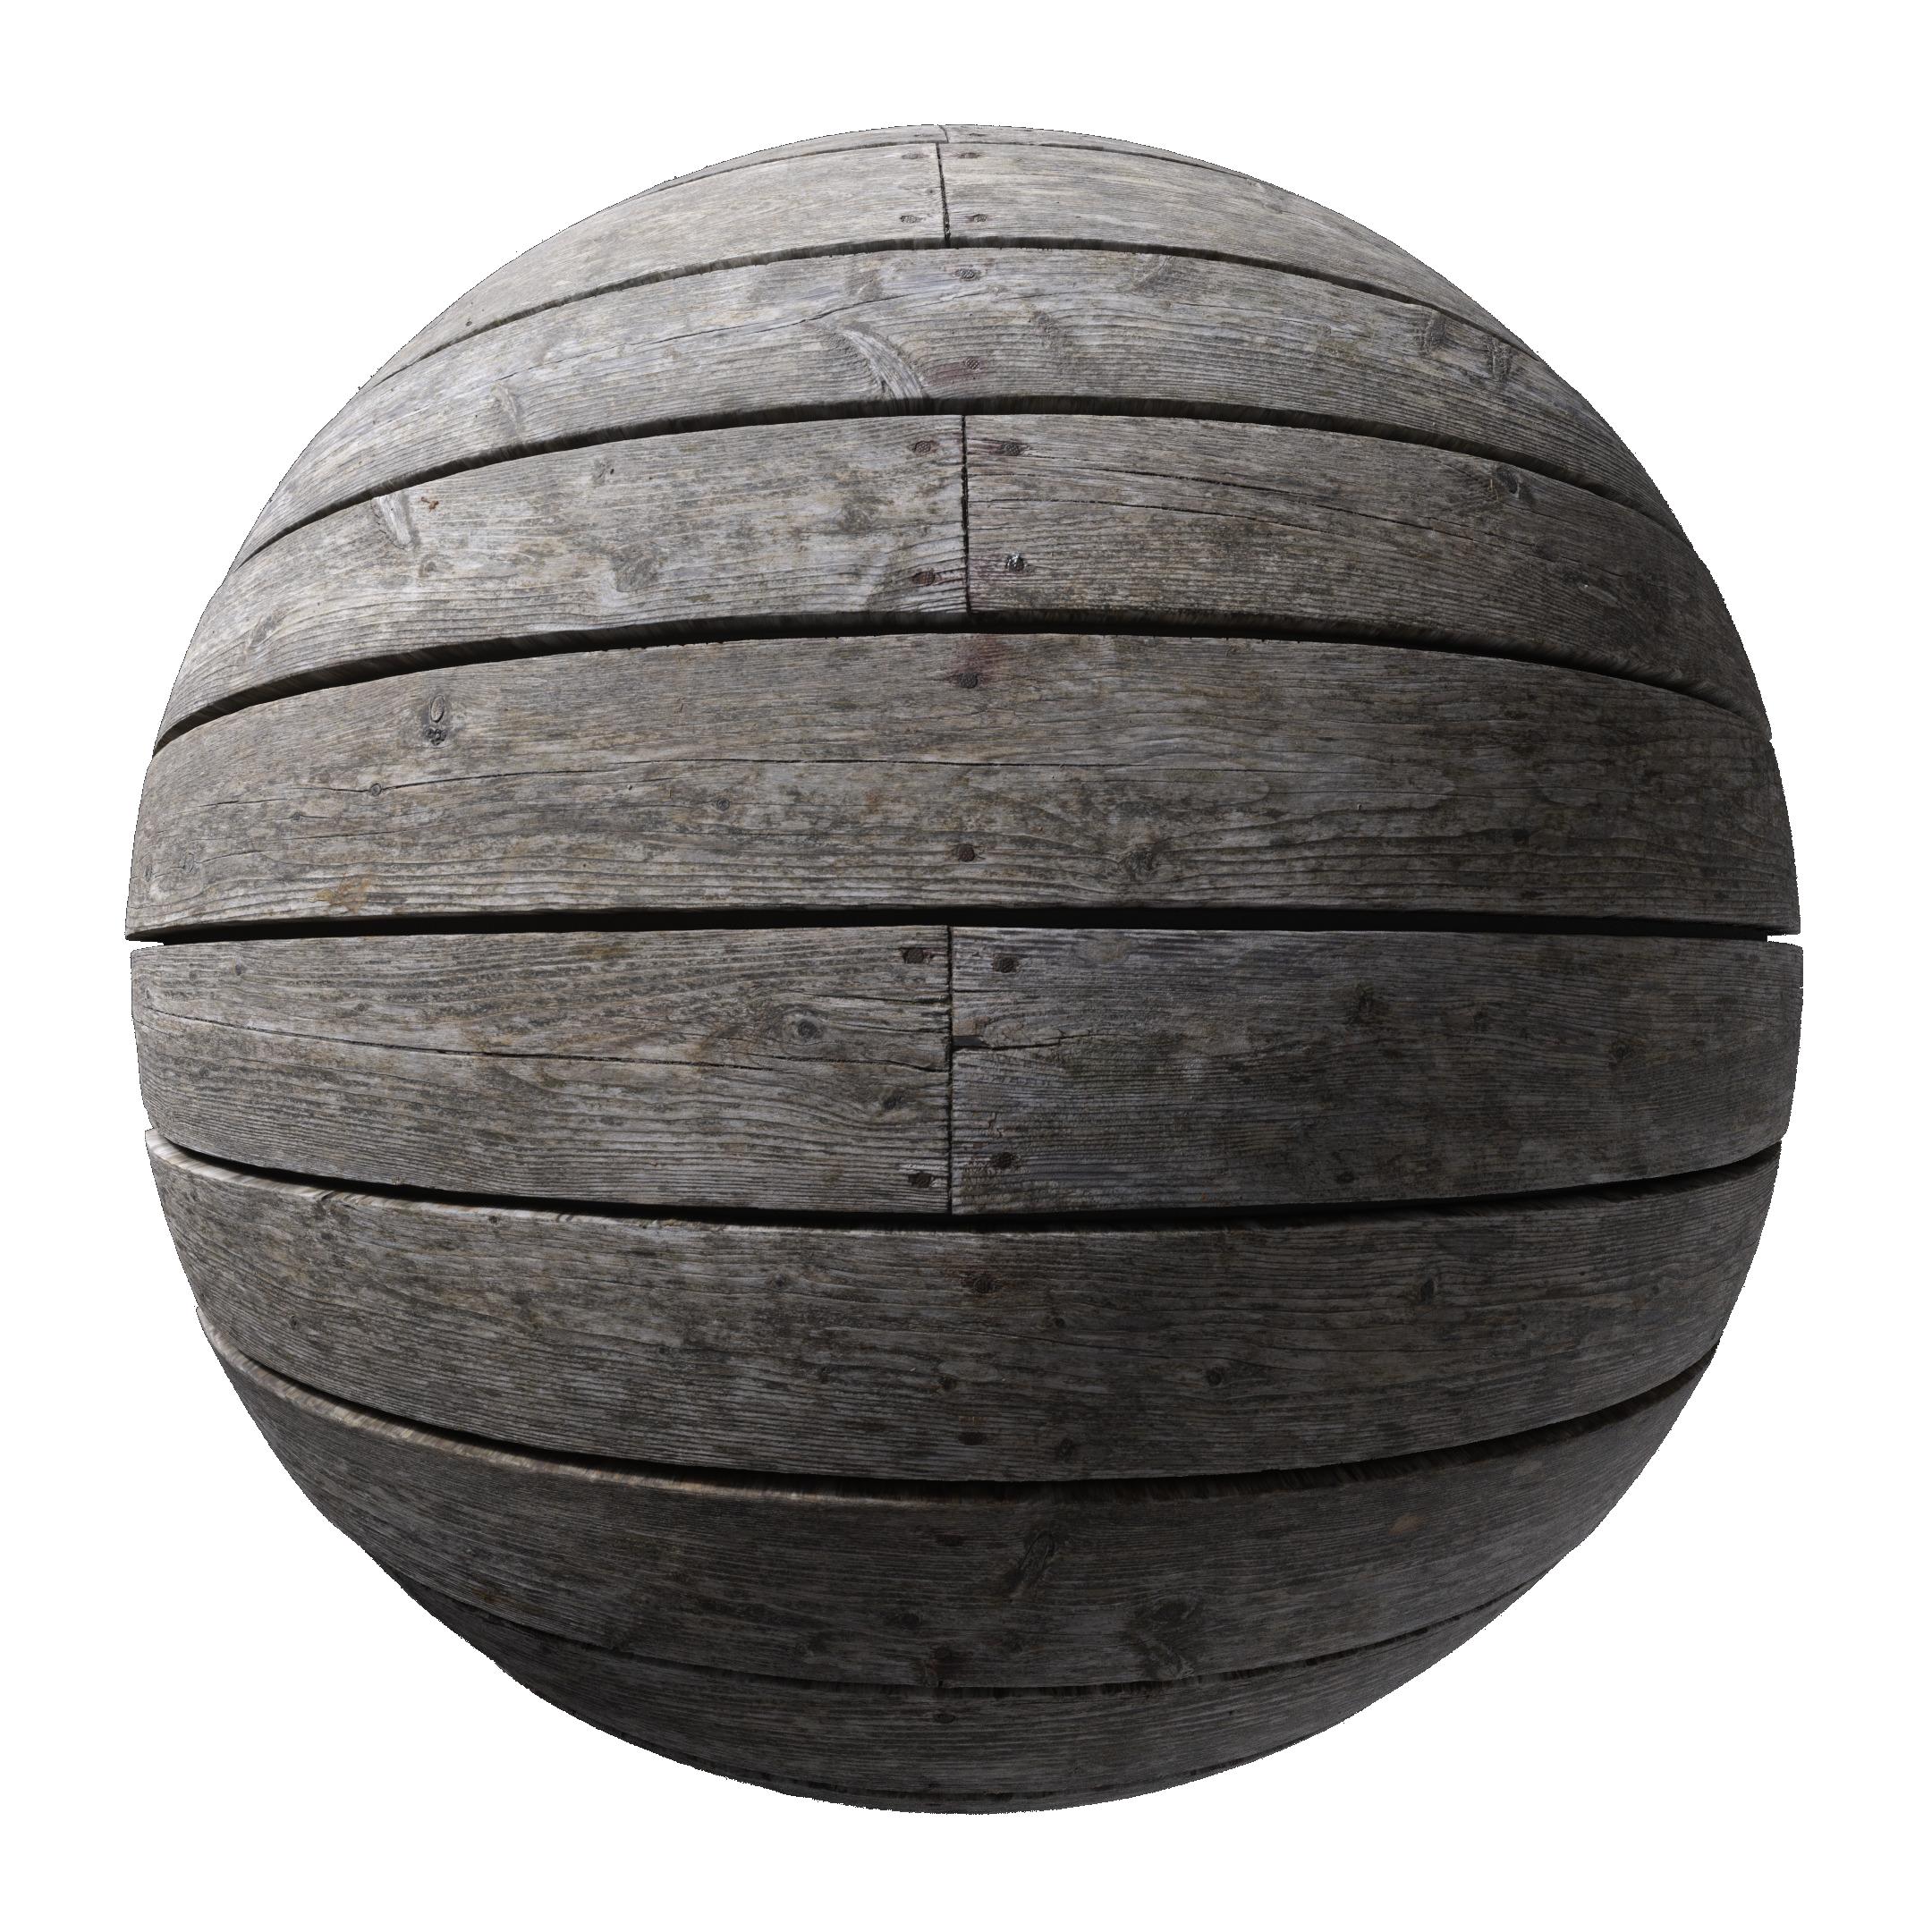 TexturesCom_Old_Planks_2_header4 copy.png